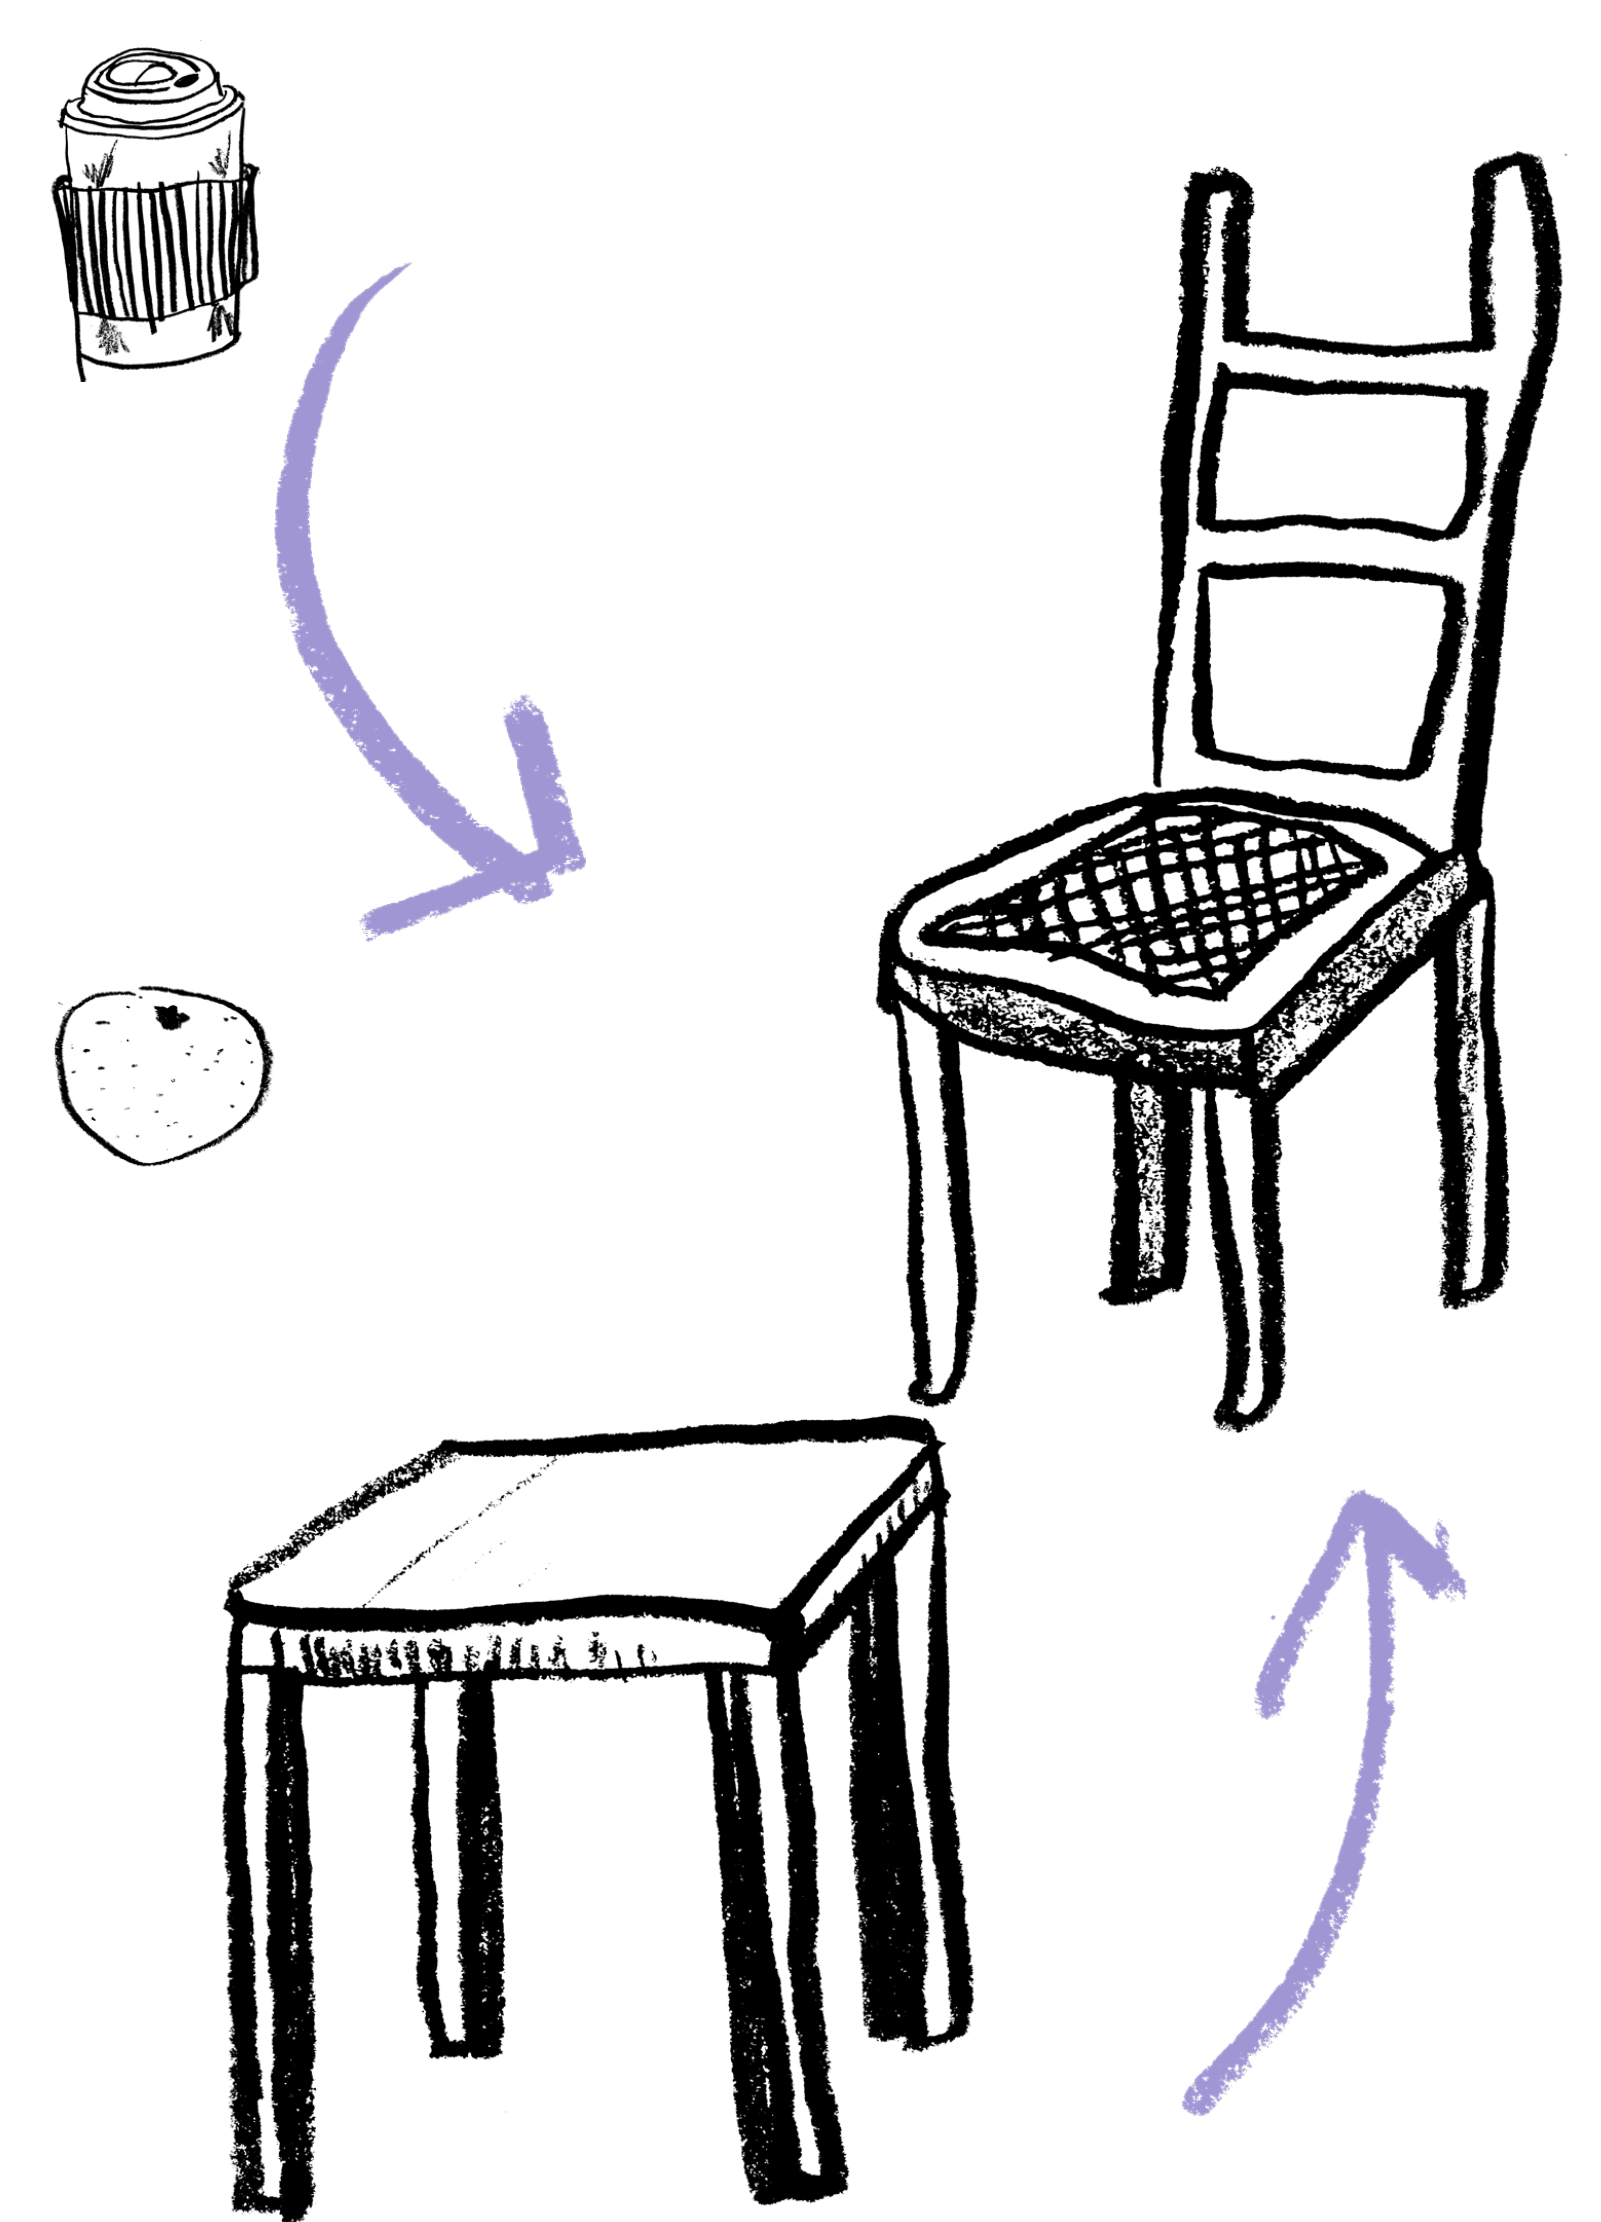 book-5-bartering-image-2